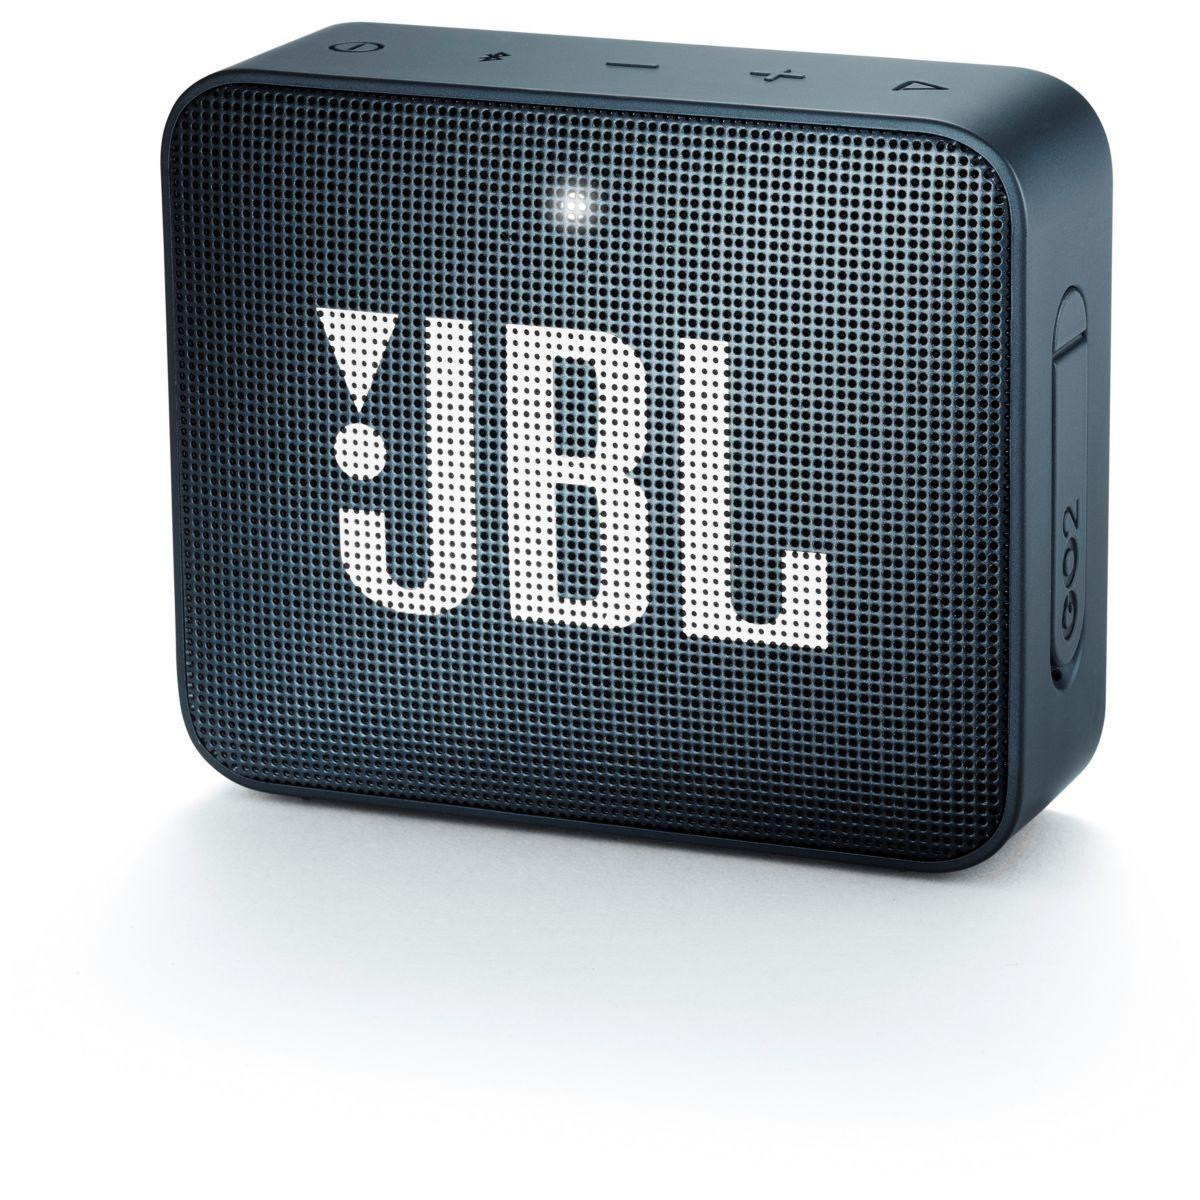 Enceinte bluetooth jbl go 2 bleu marin - livraison offerte : code livdom (photo)